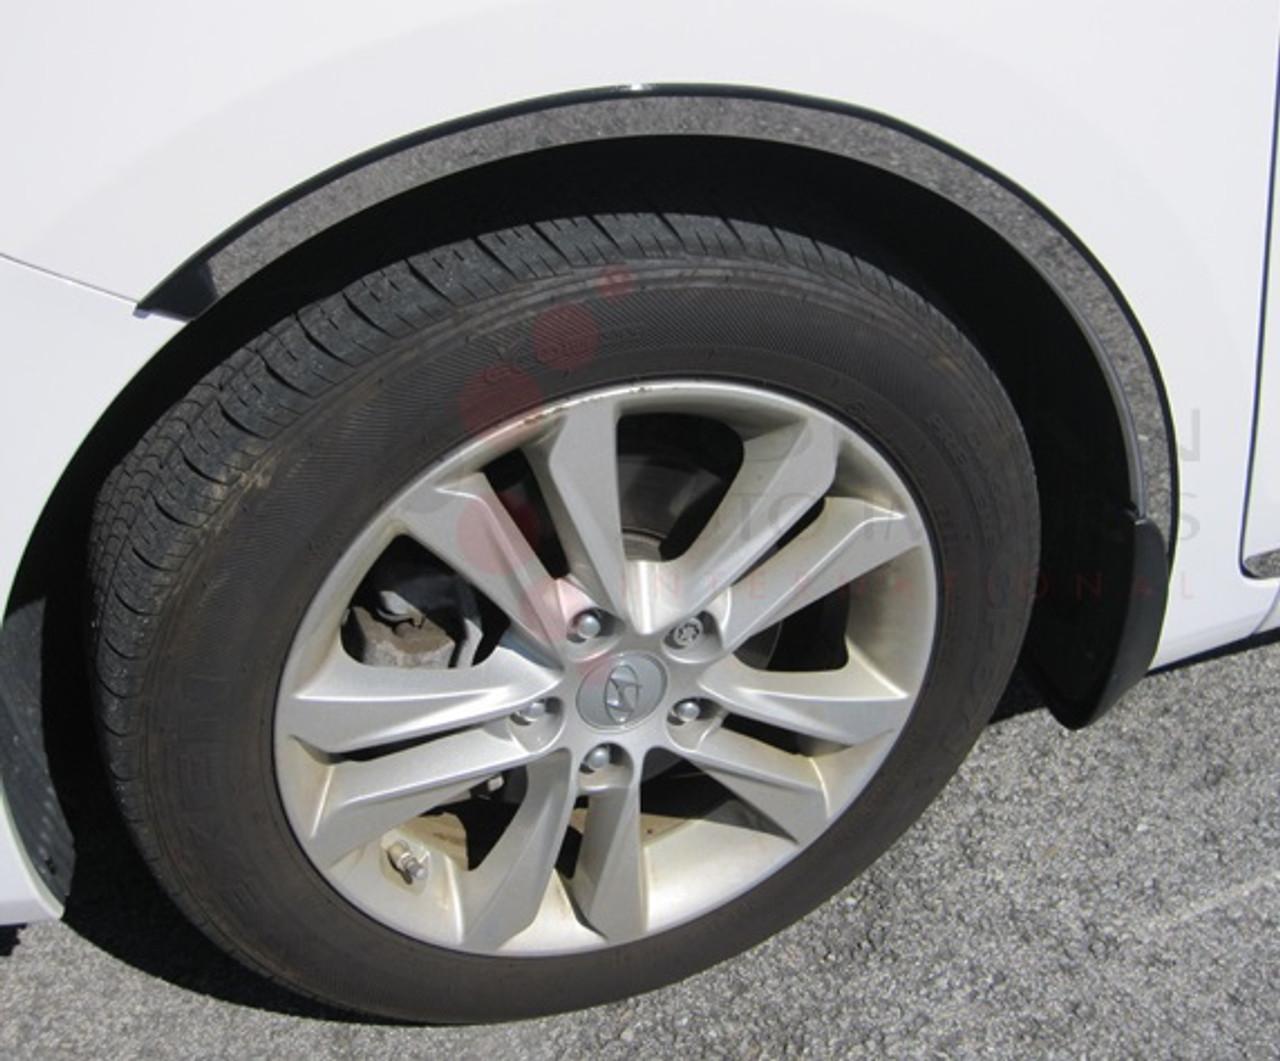 2012 I30 Elantra Gt Stainless Steel Chrome Wheel Well Trim 7 8 Width 4pc Saa Korean Auto Imports